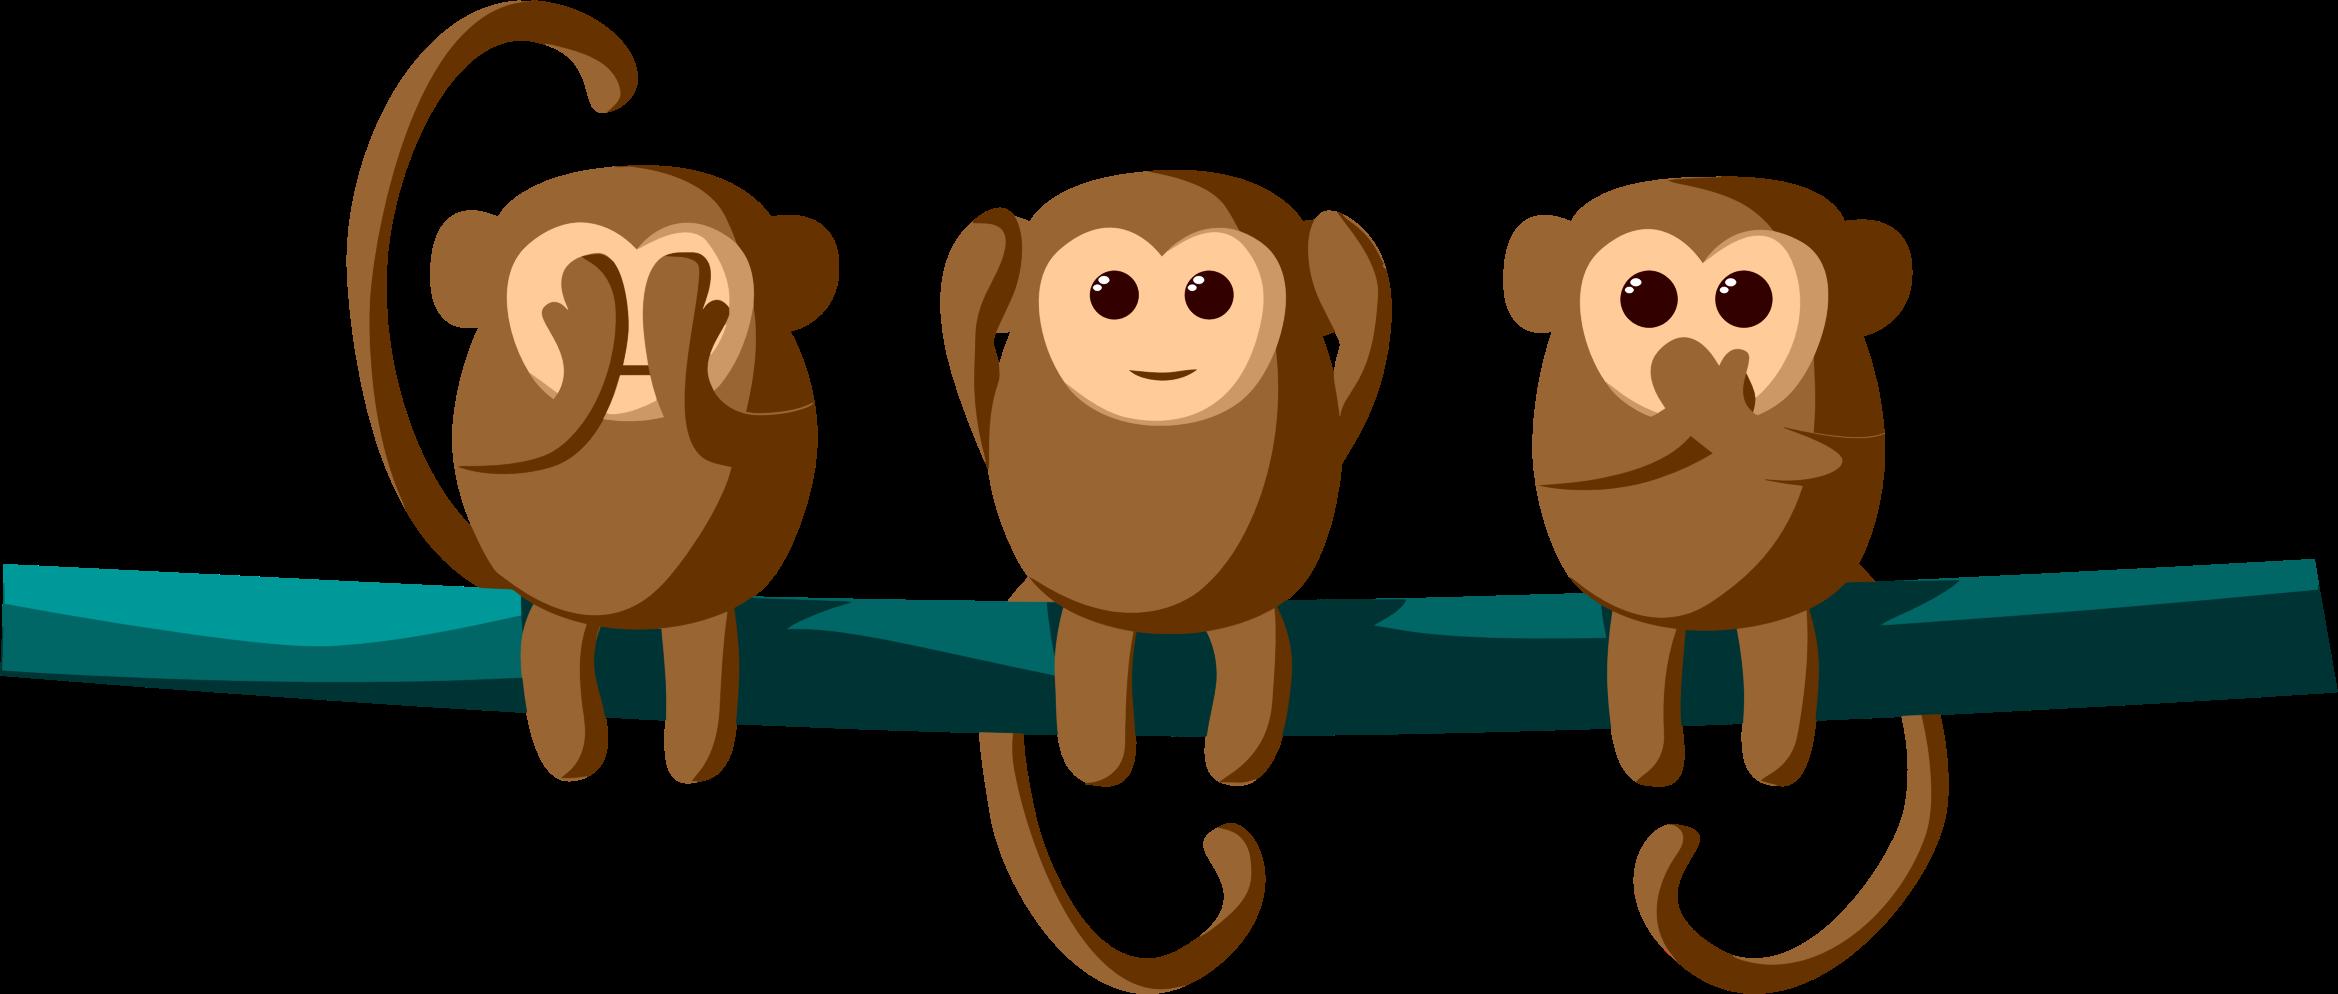 image free stock Hear clipart. See speak monkeys big